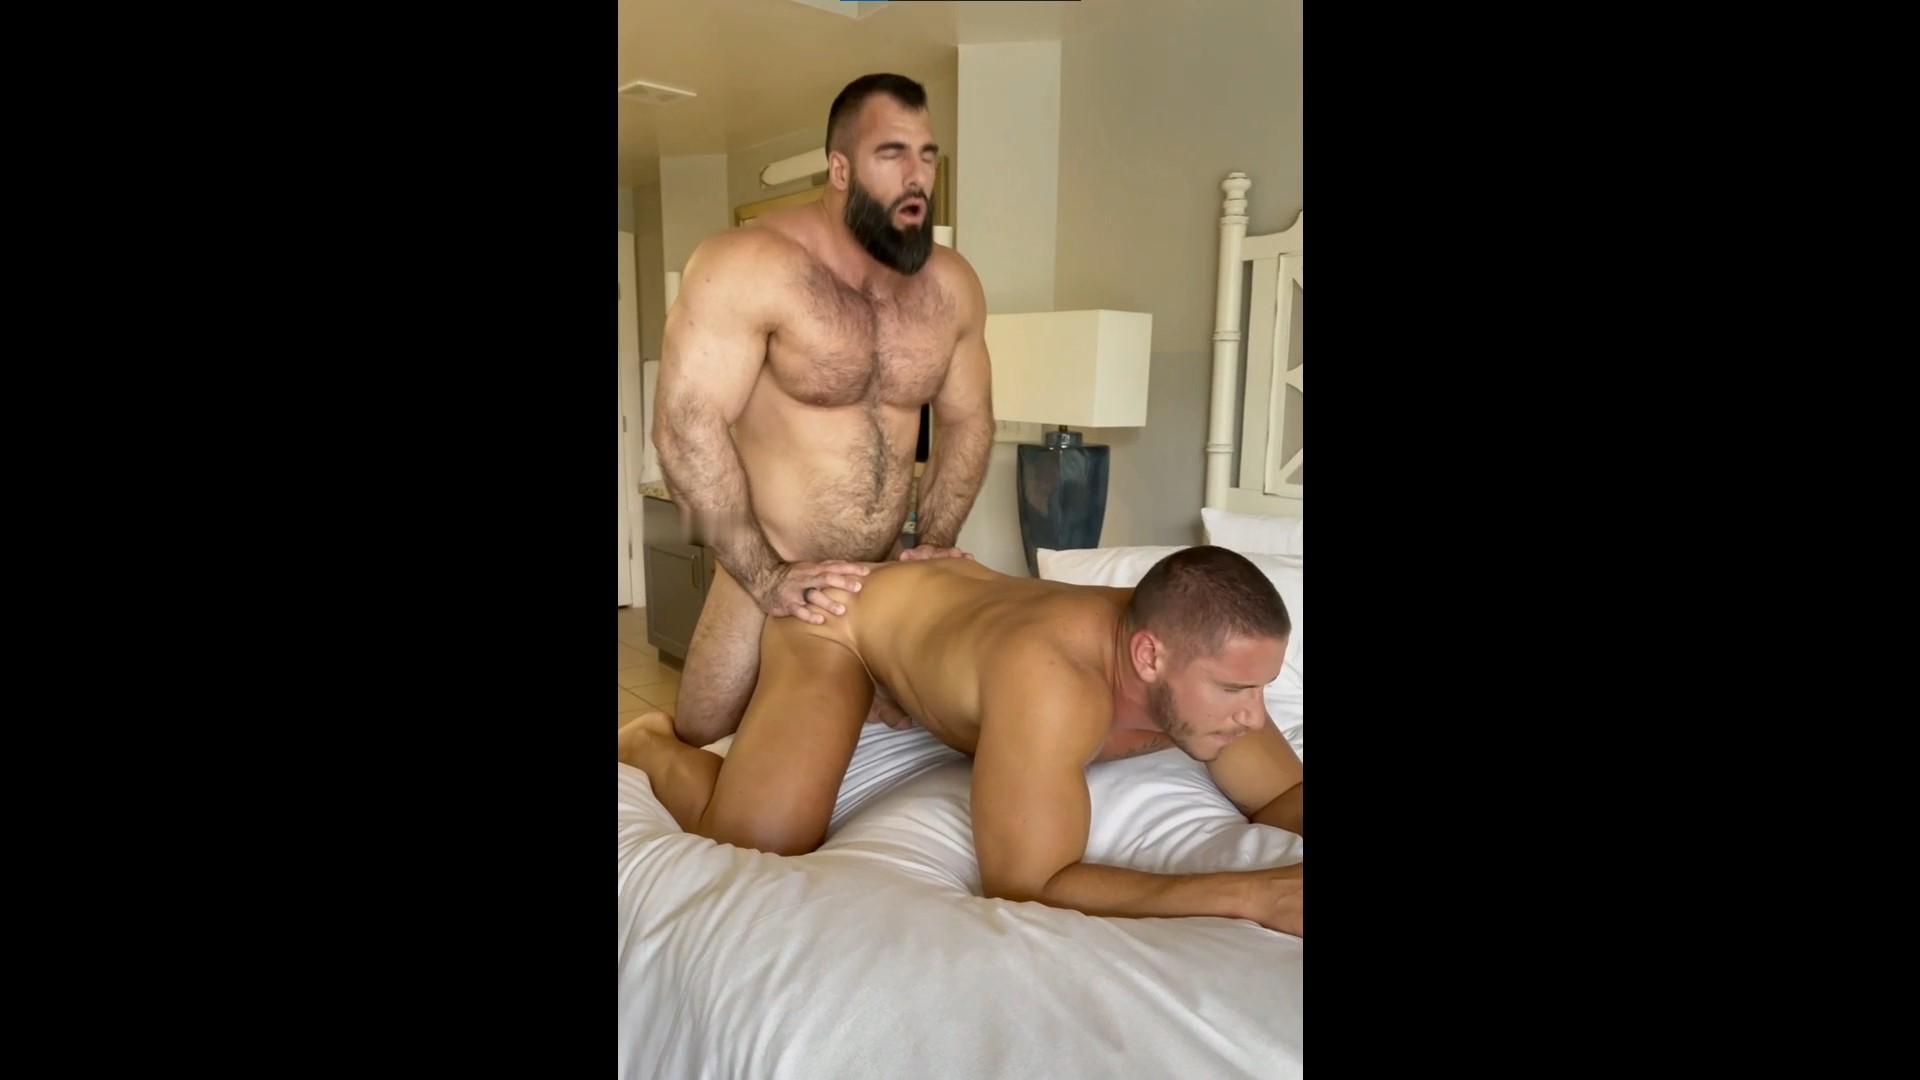 Nick Pulos (modern_spartan) fucks John Bronco (Johnbronco87) – Gay for Fans – gayforfans.com